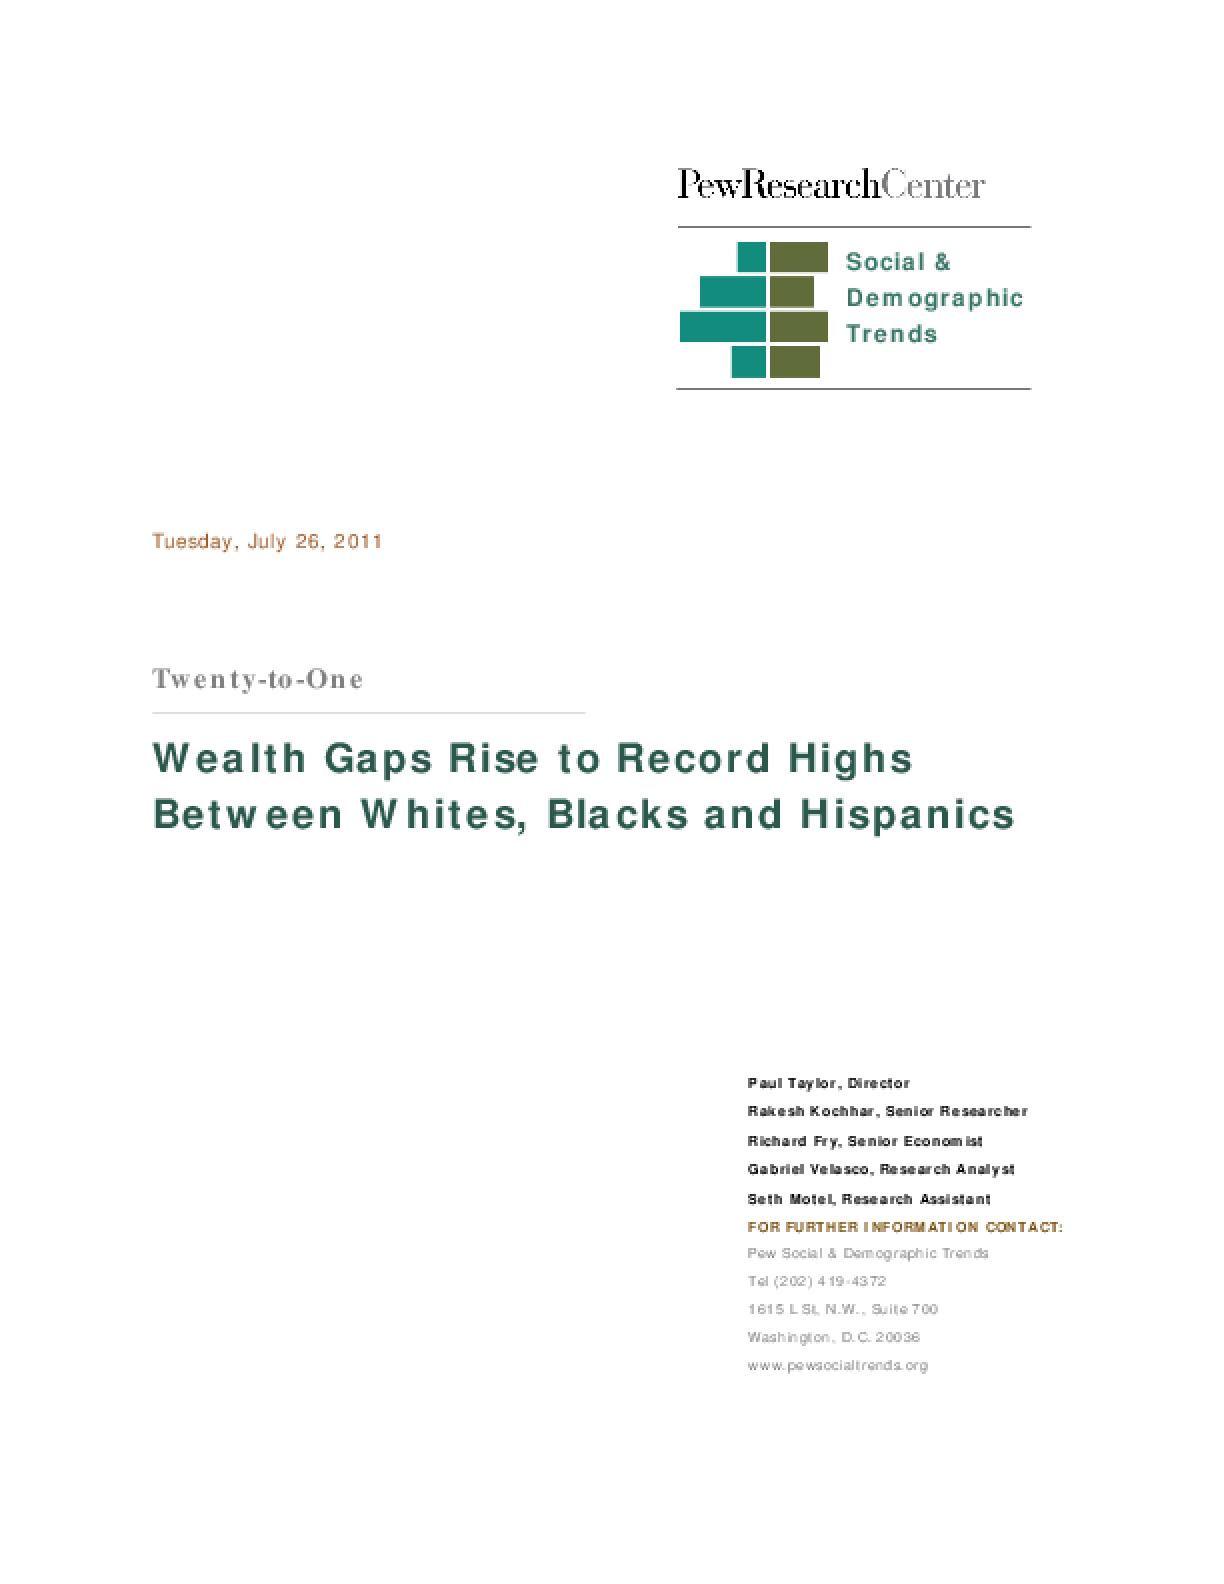 Wealth Gaps Rise to Record Highs Between Whites, Blacks and Hispanics